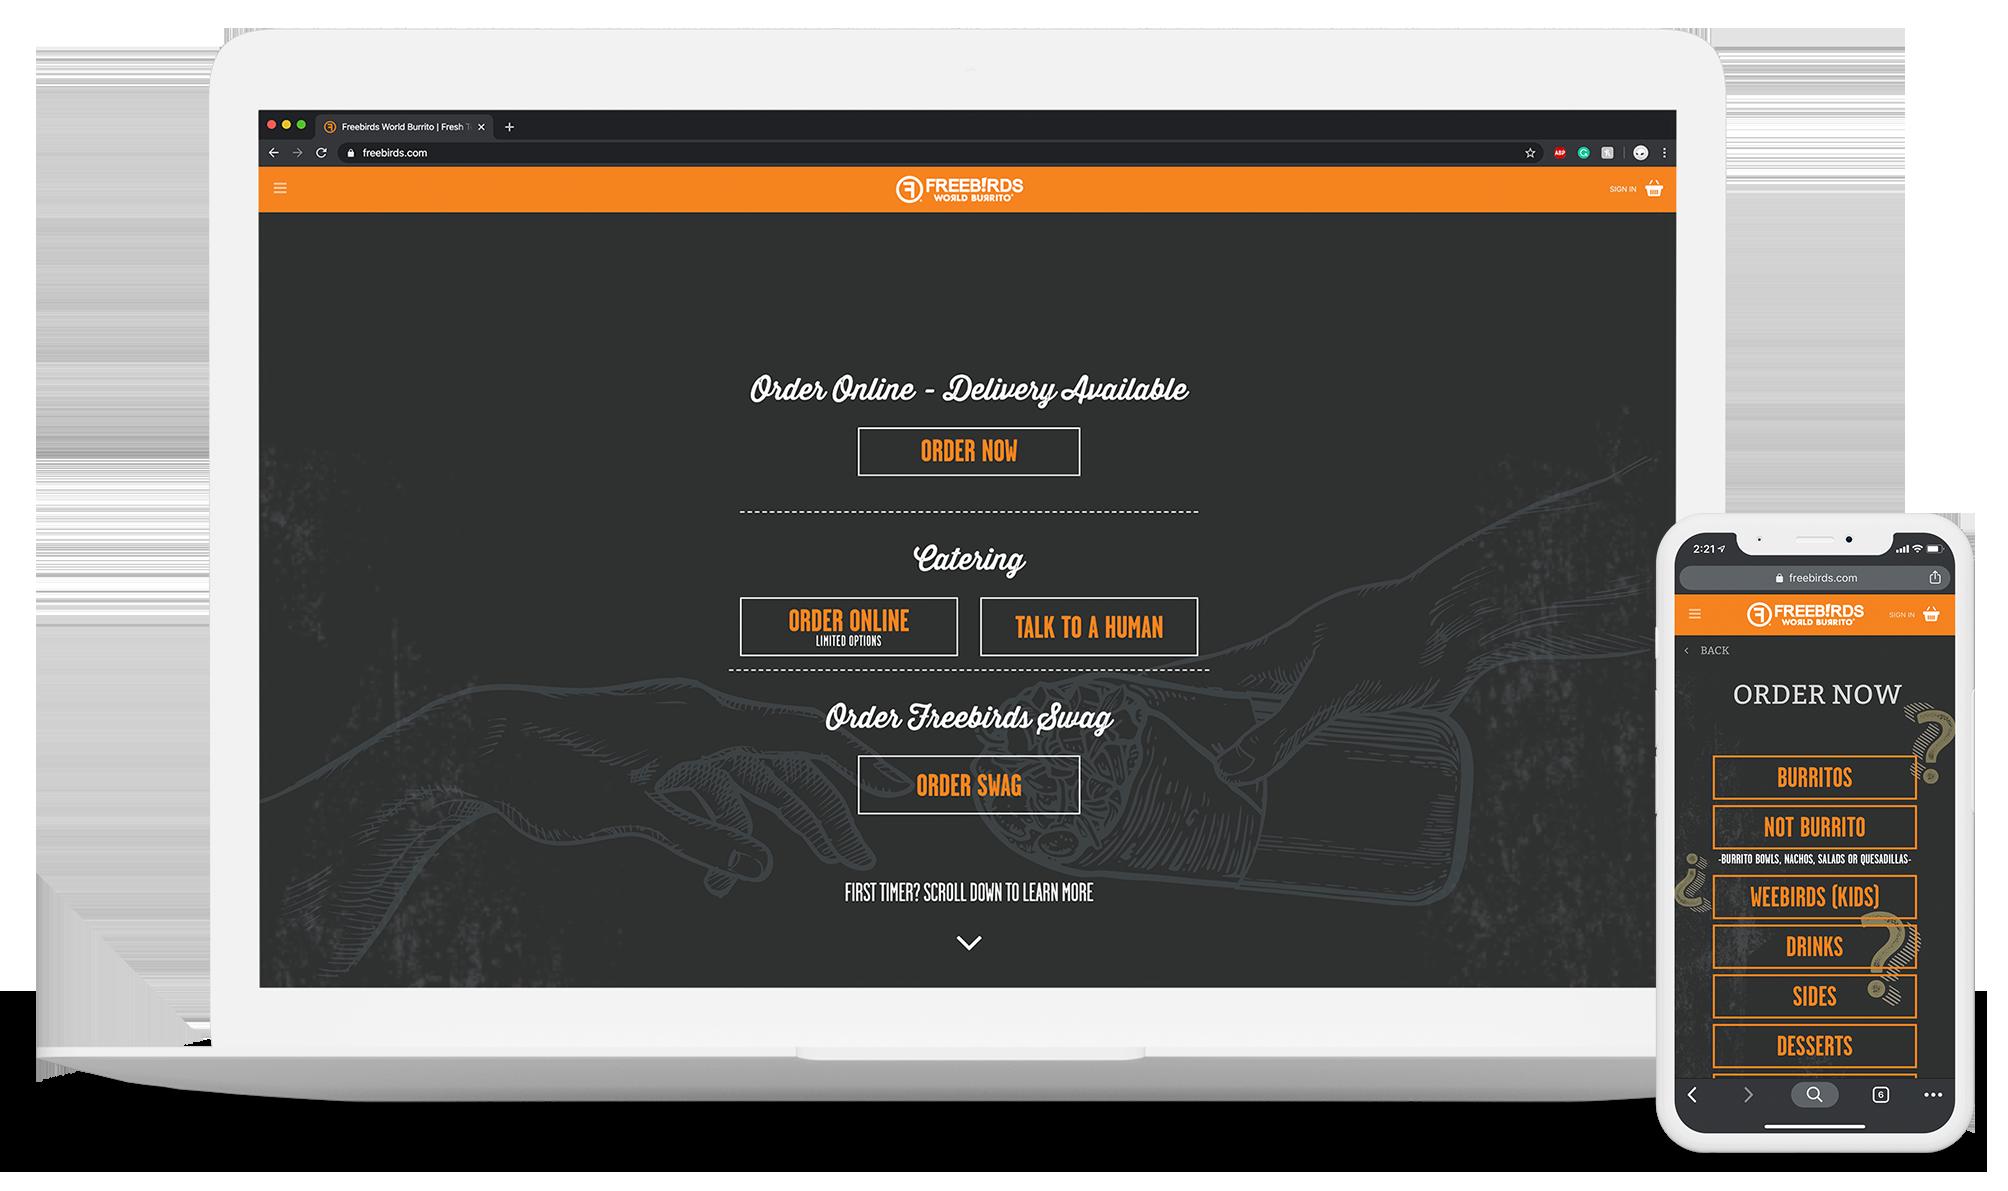 Restaurant UI Design and App Development